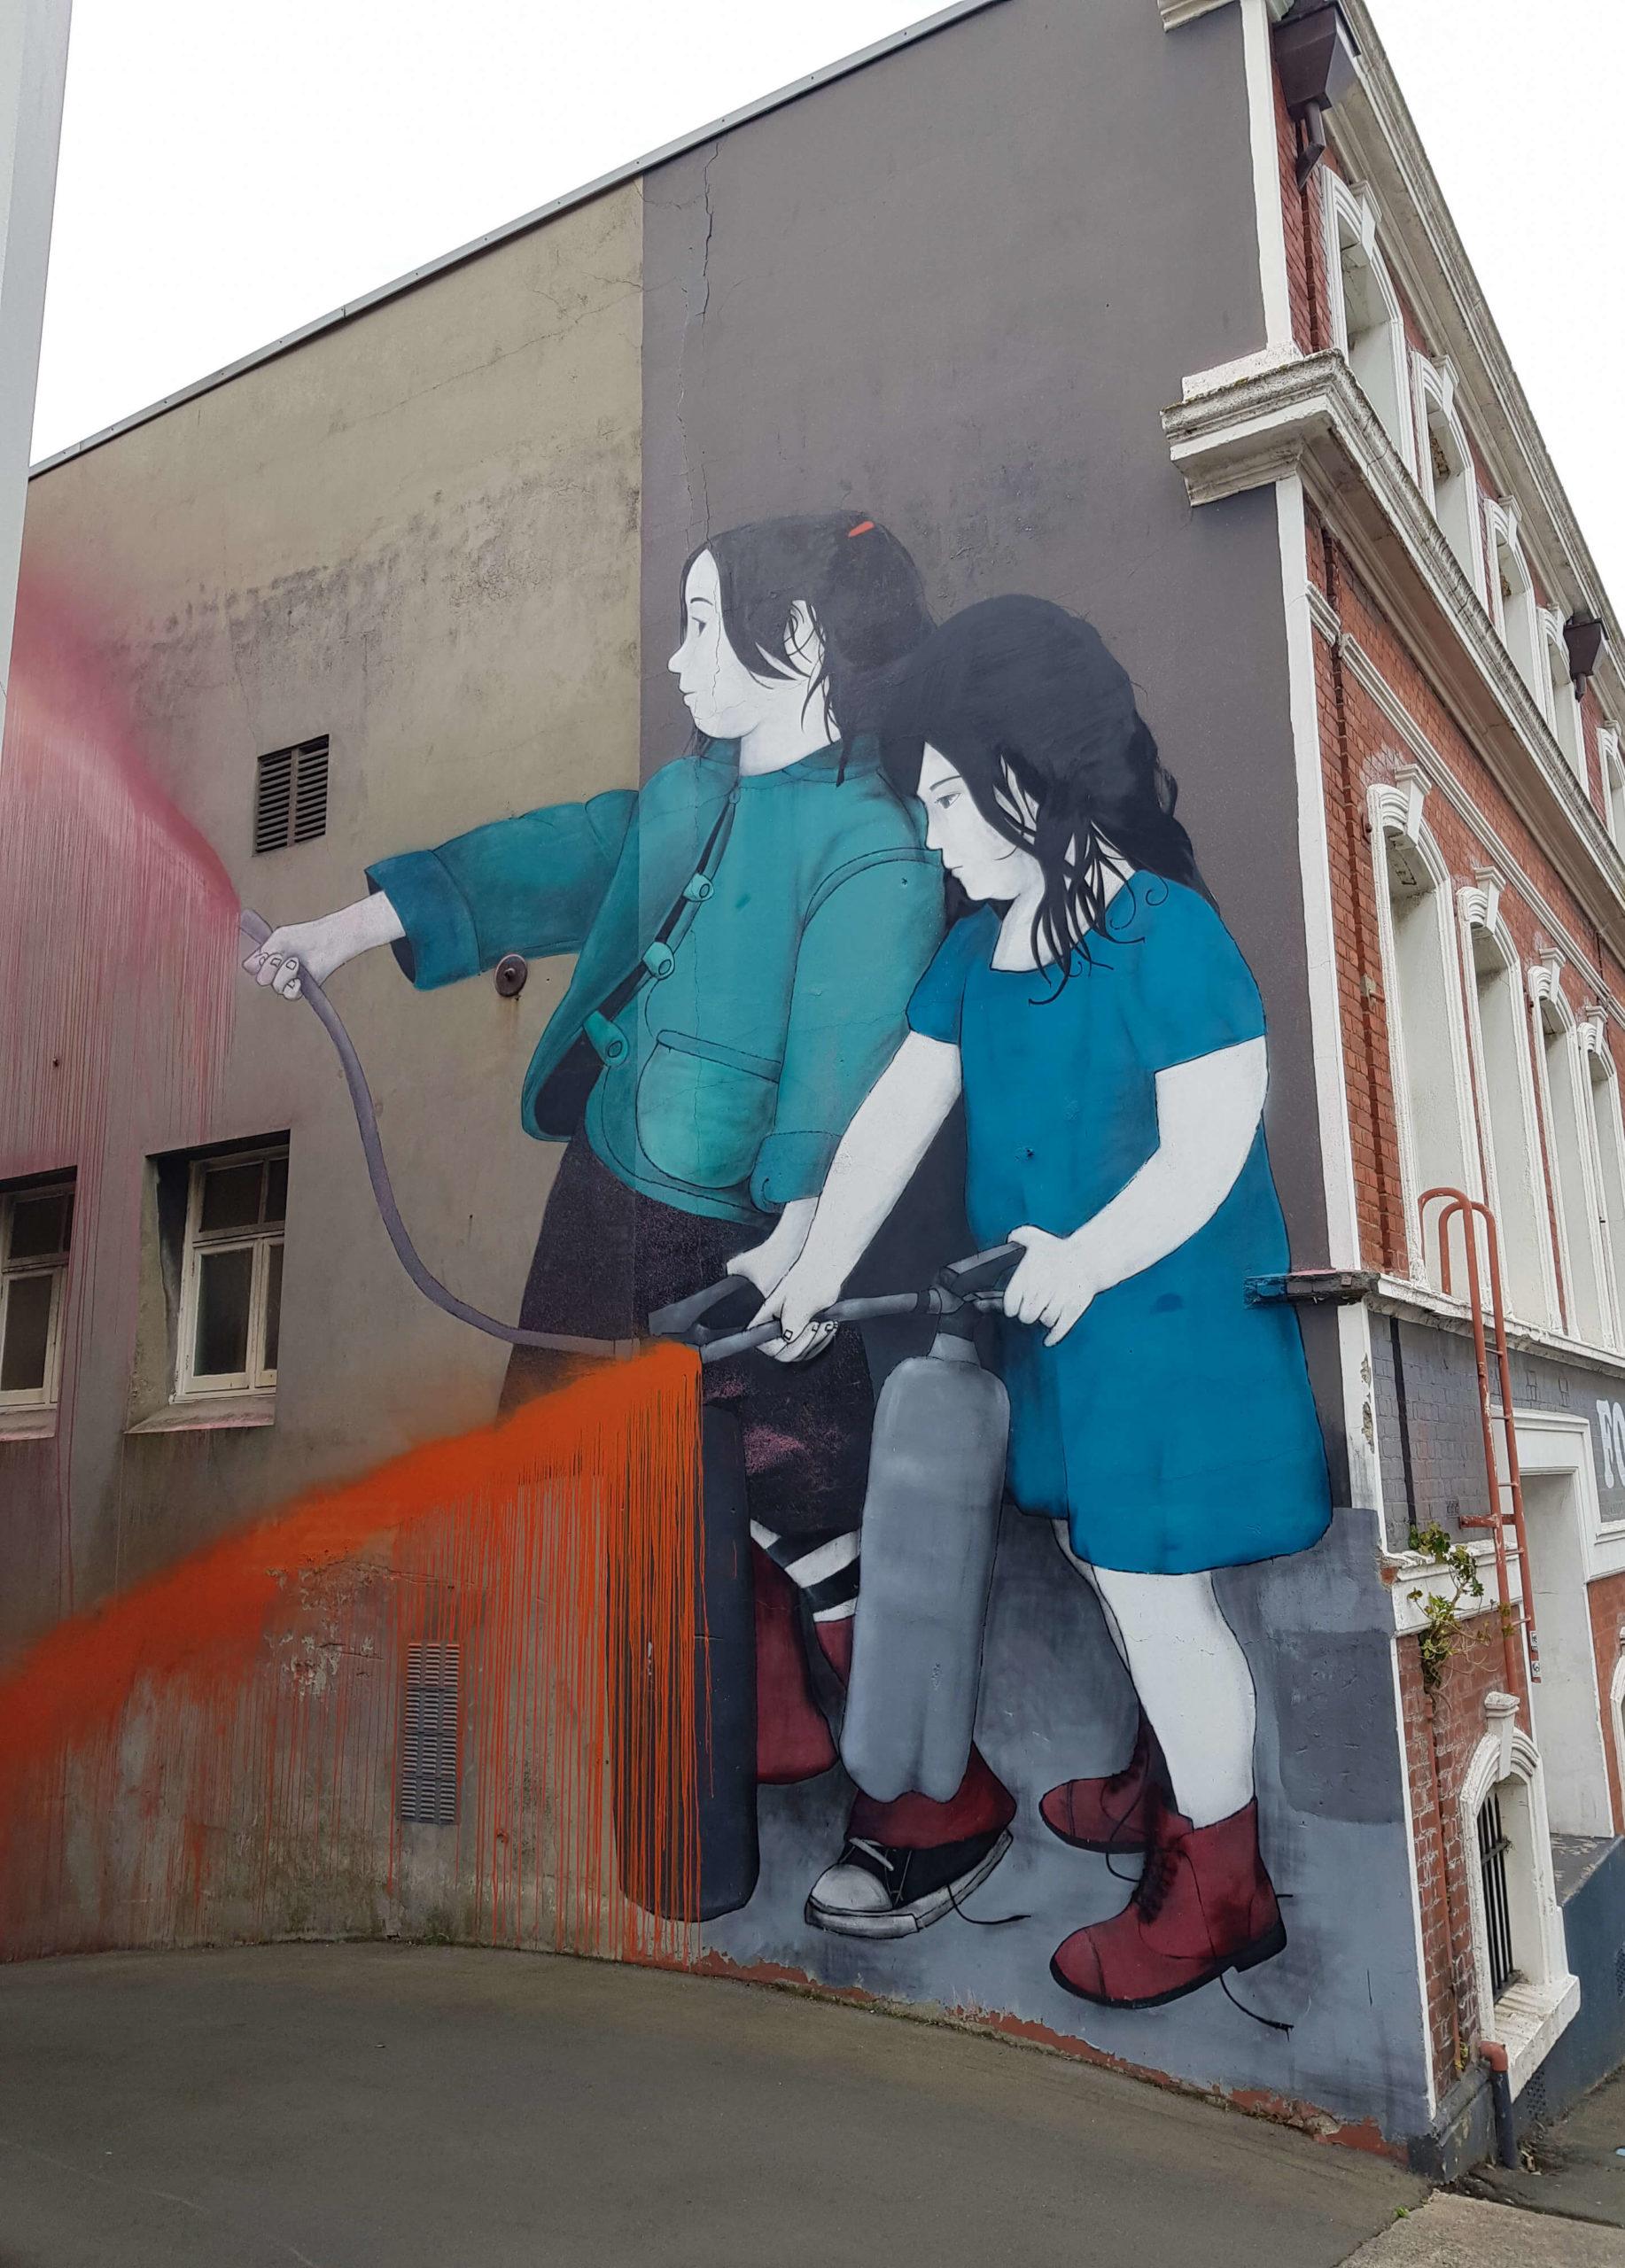 Enfants et peinture street art trail Dunedin